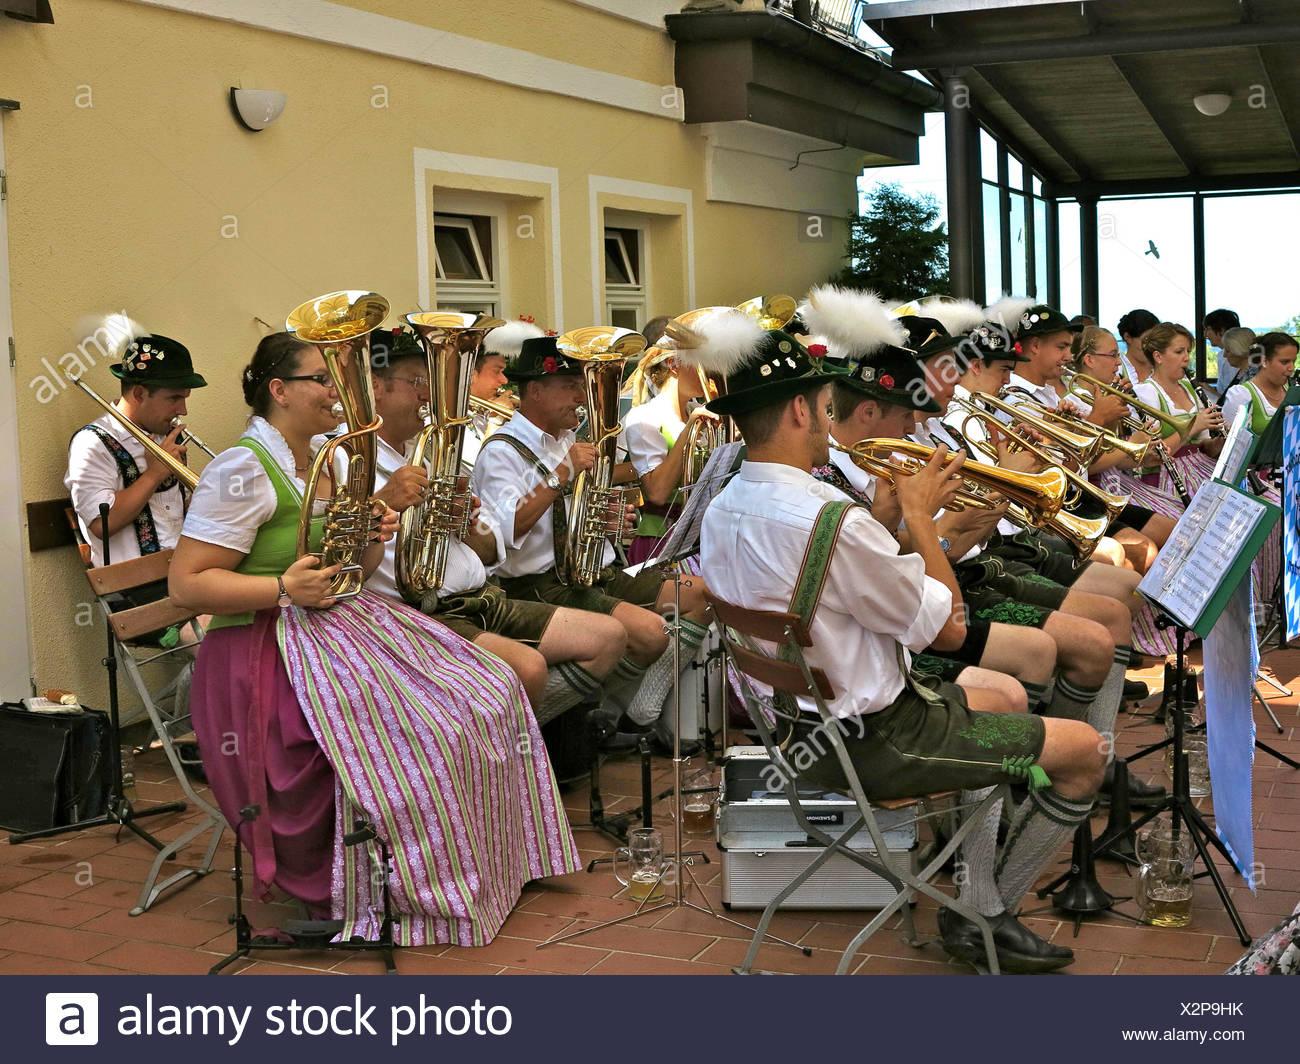 Beer Garden Musician Stock Photos & Beer Garden Musician Stock ...